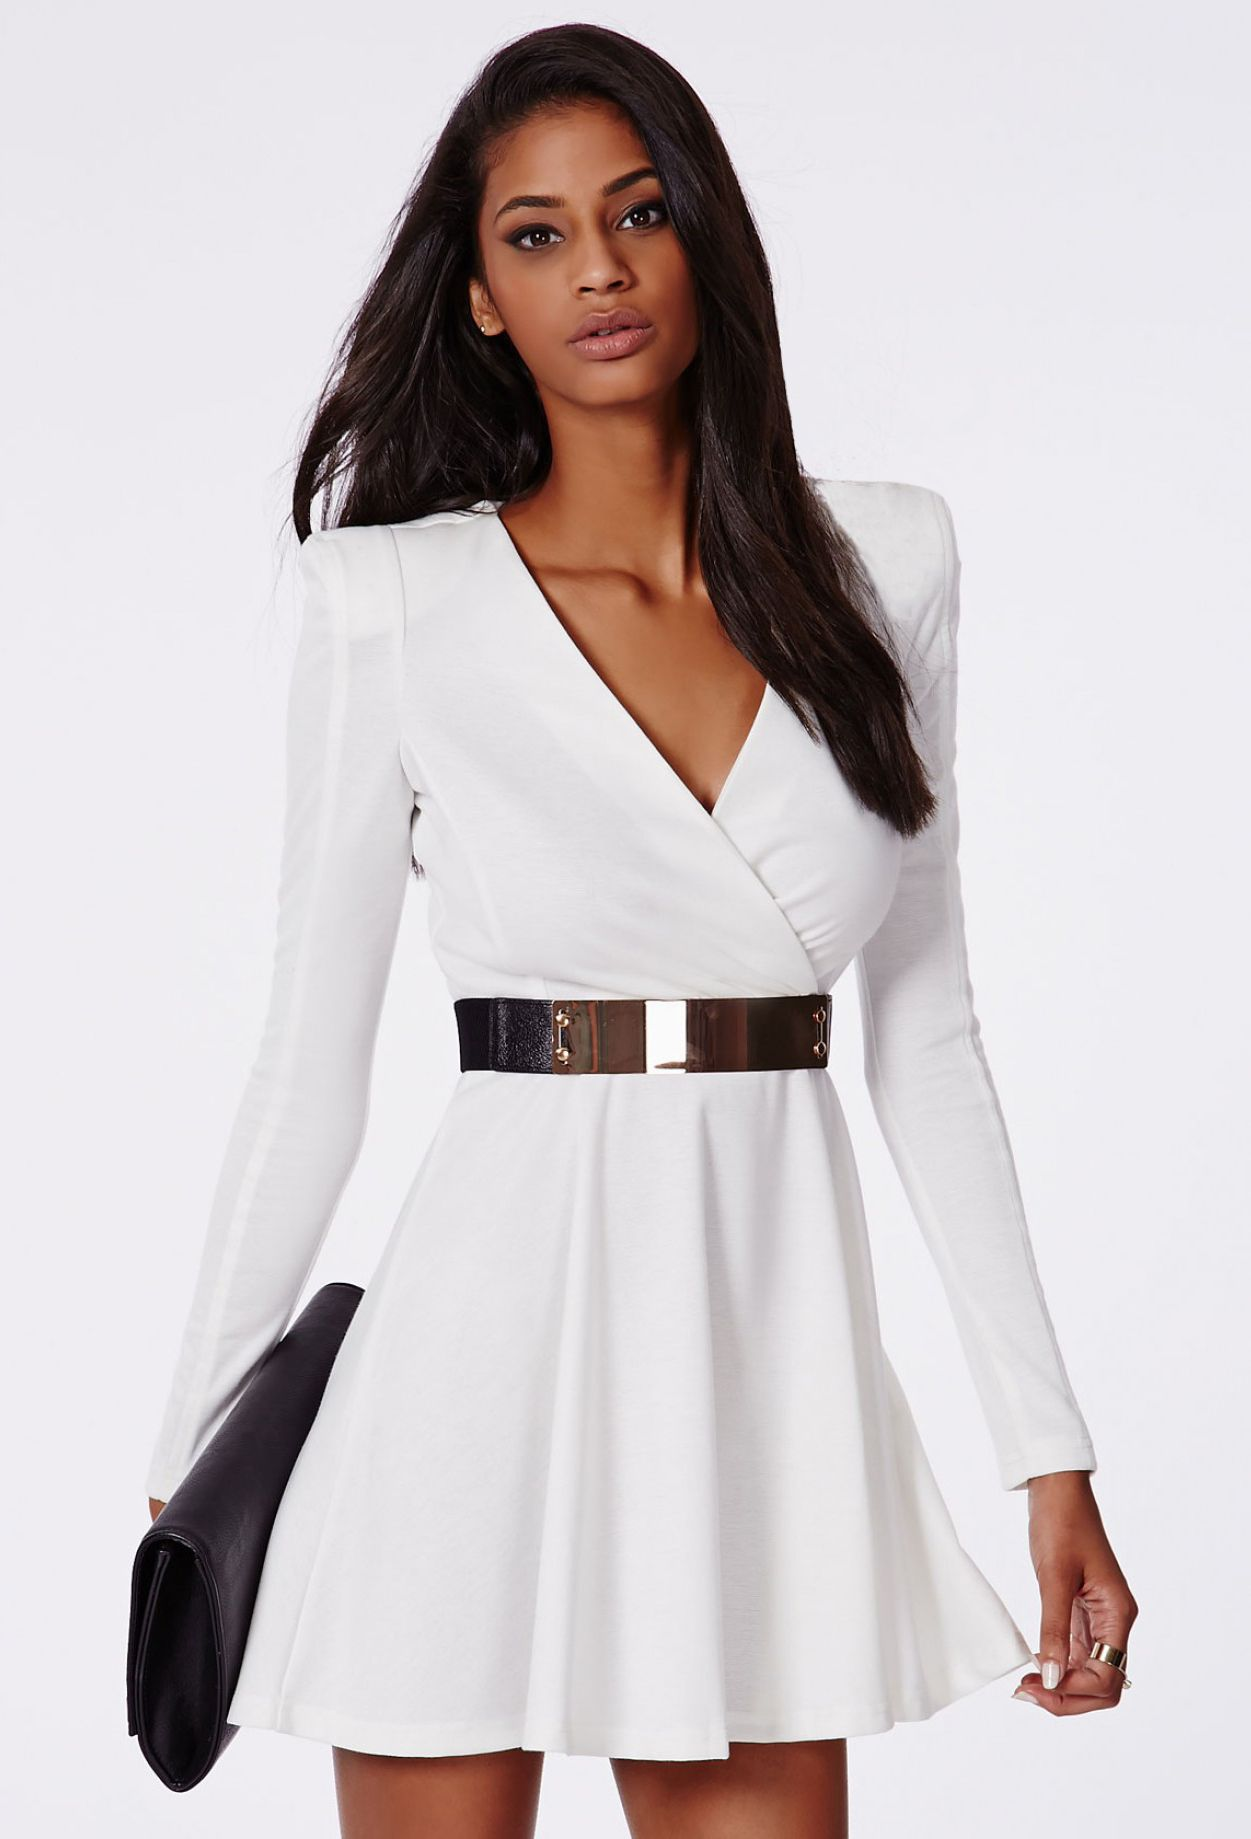 4f8869a462 White Long Sleeve V Neck Dress 25.99